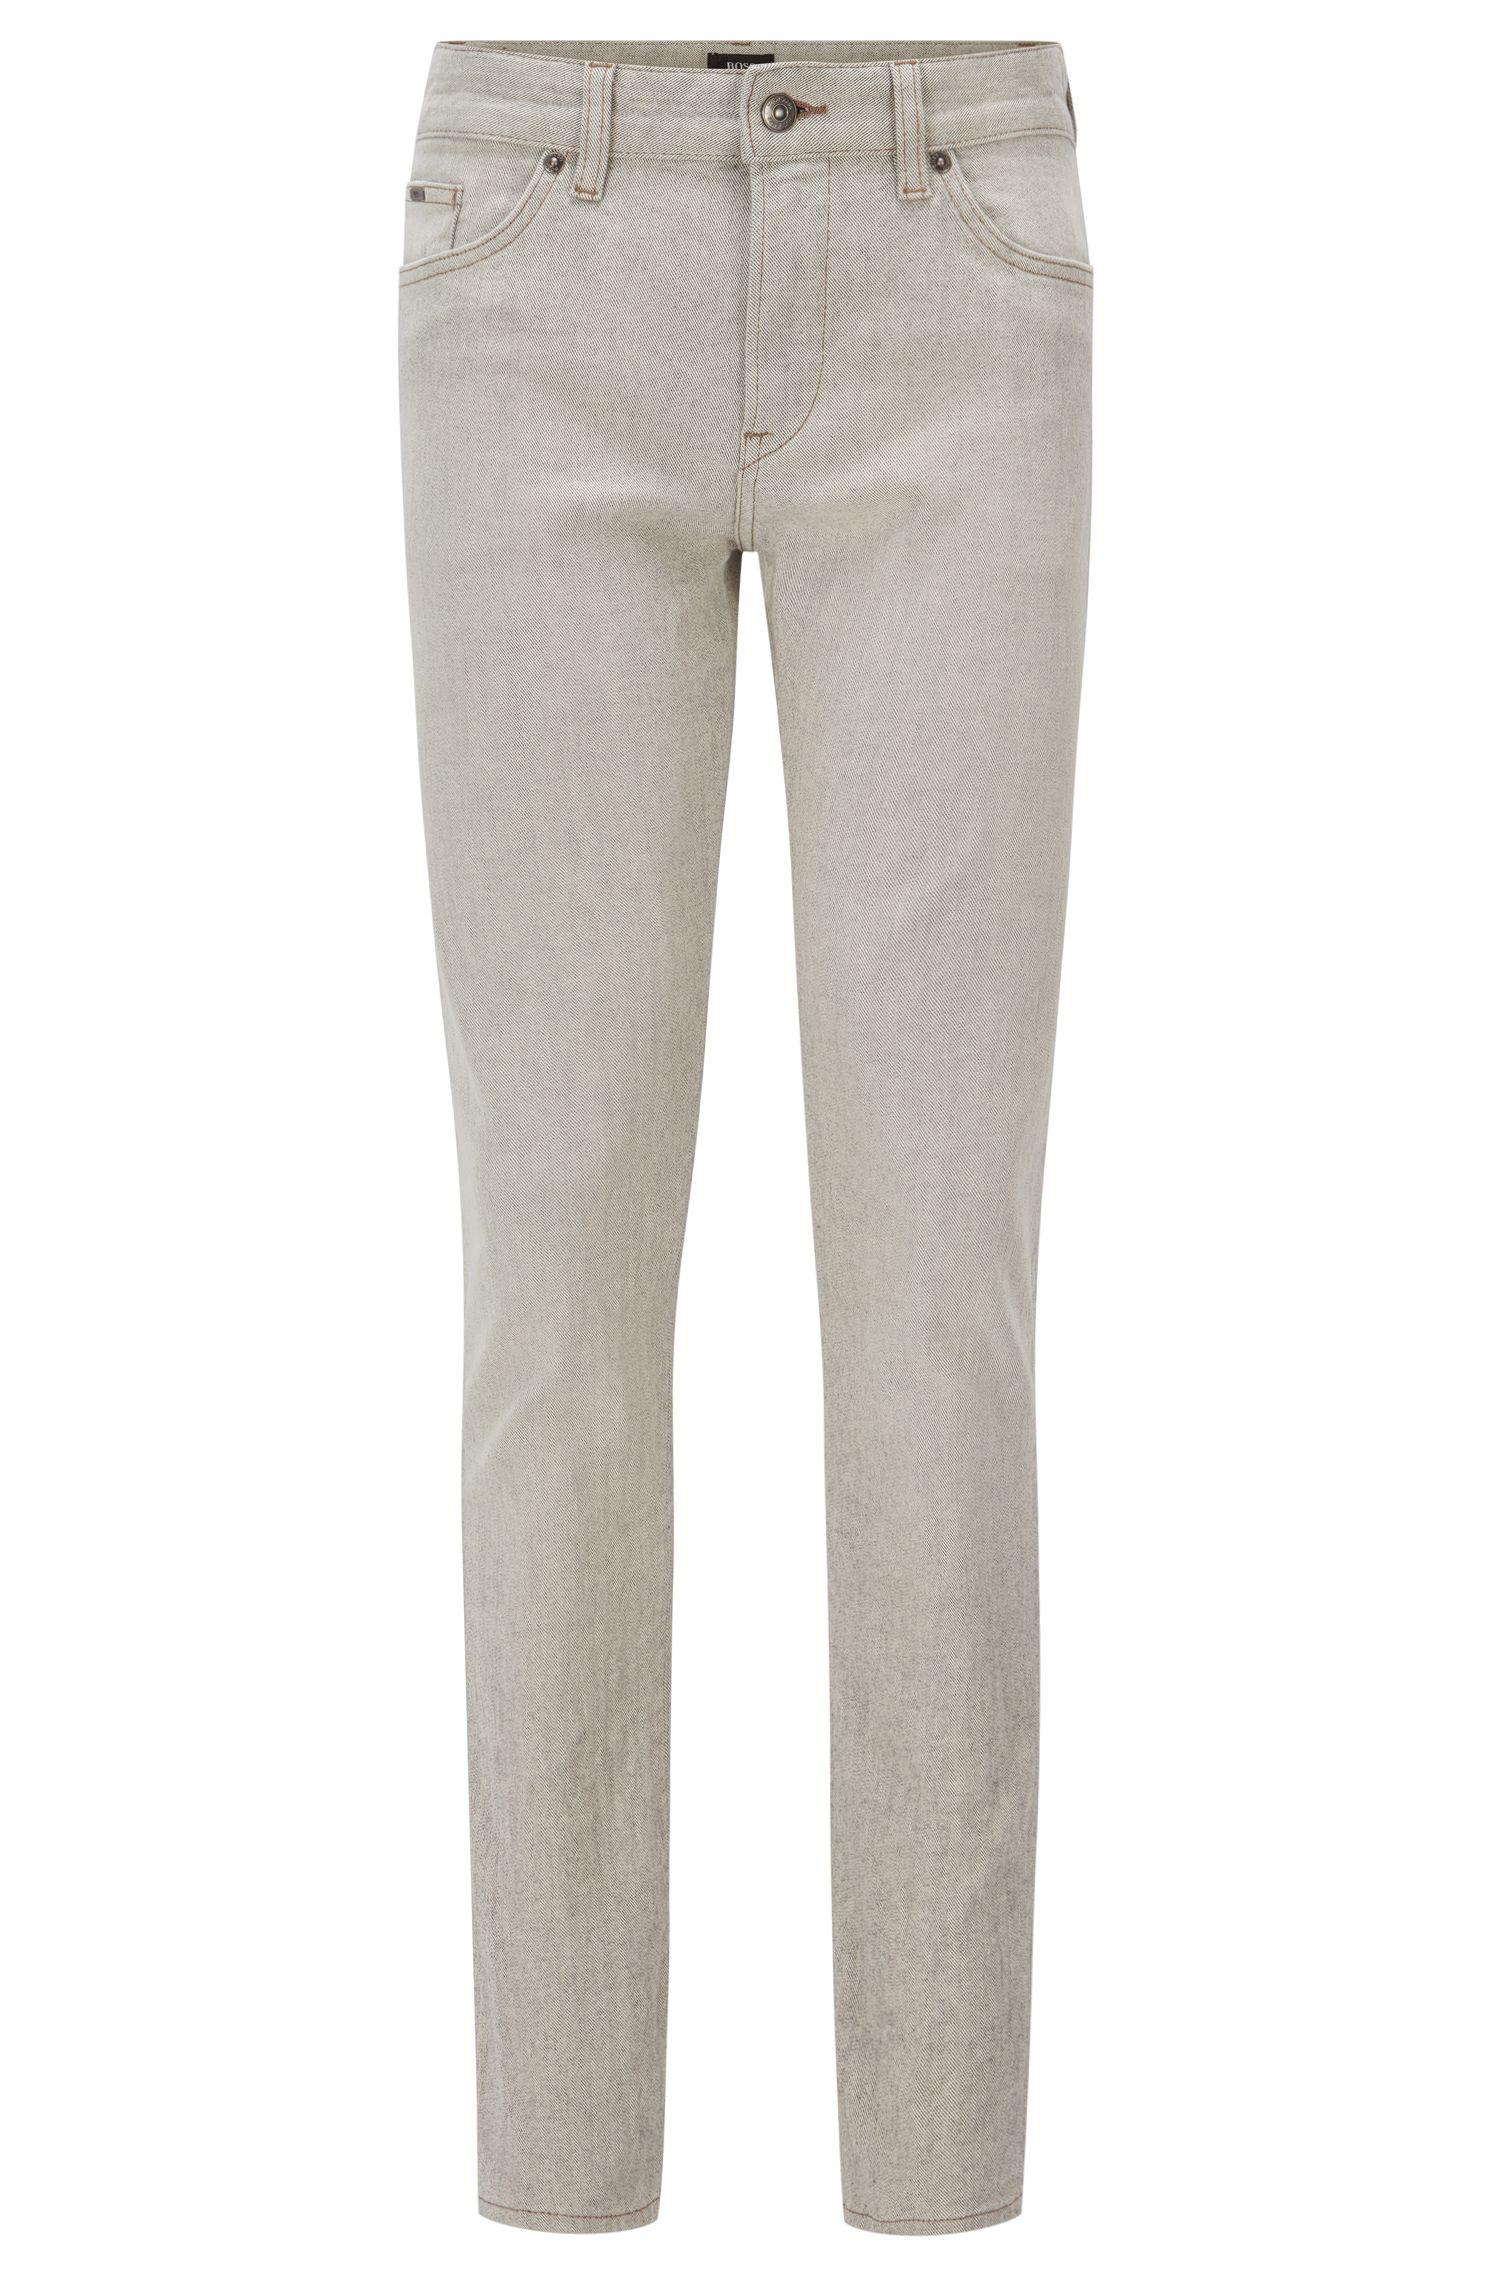 10.7 oz Italian Stetch Cotton Jeans, Slim Fit | Delaware